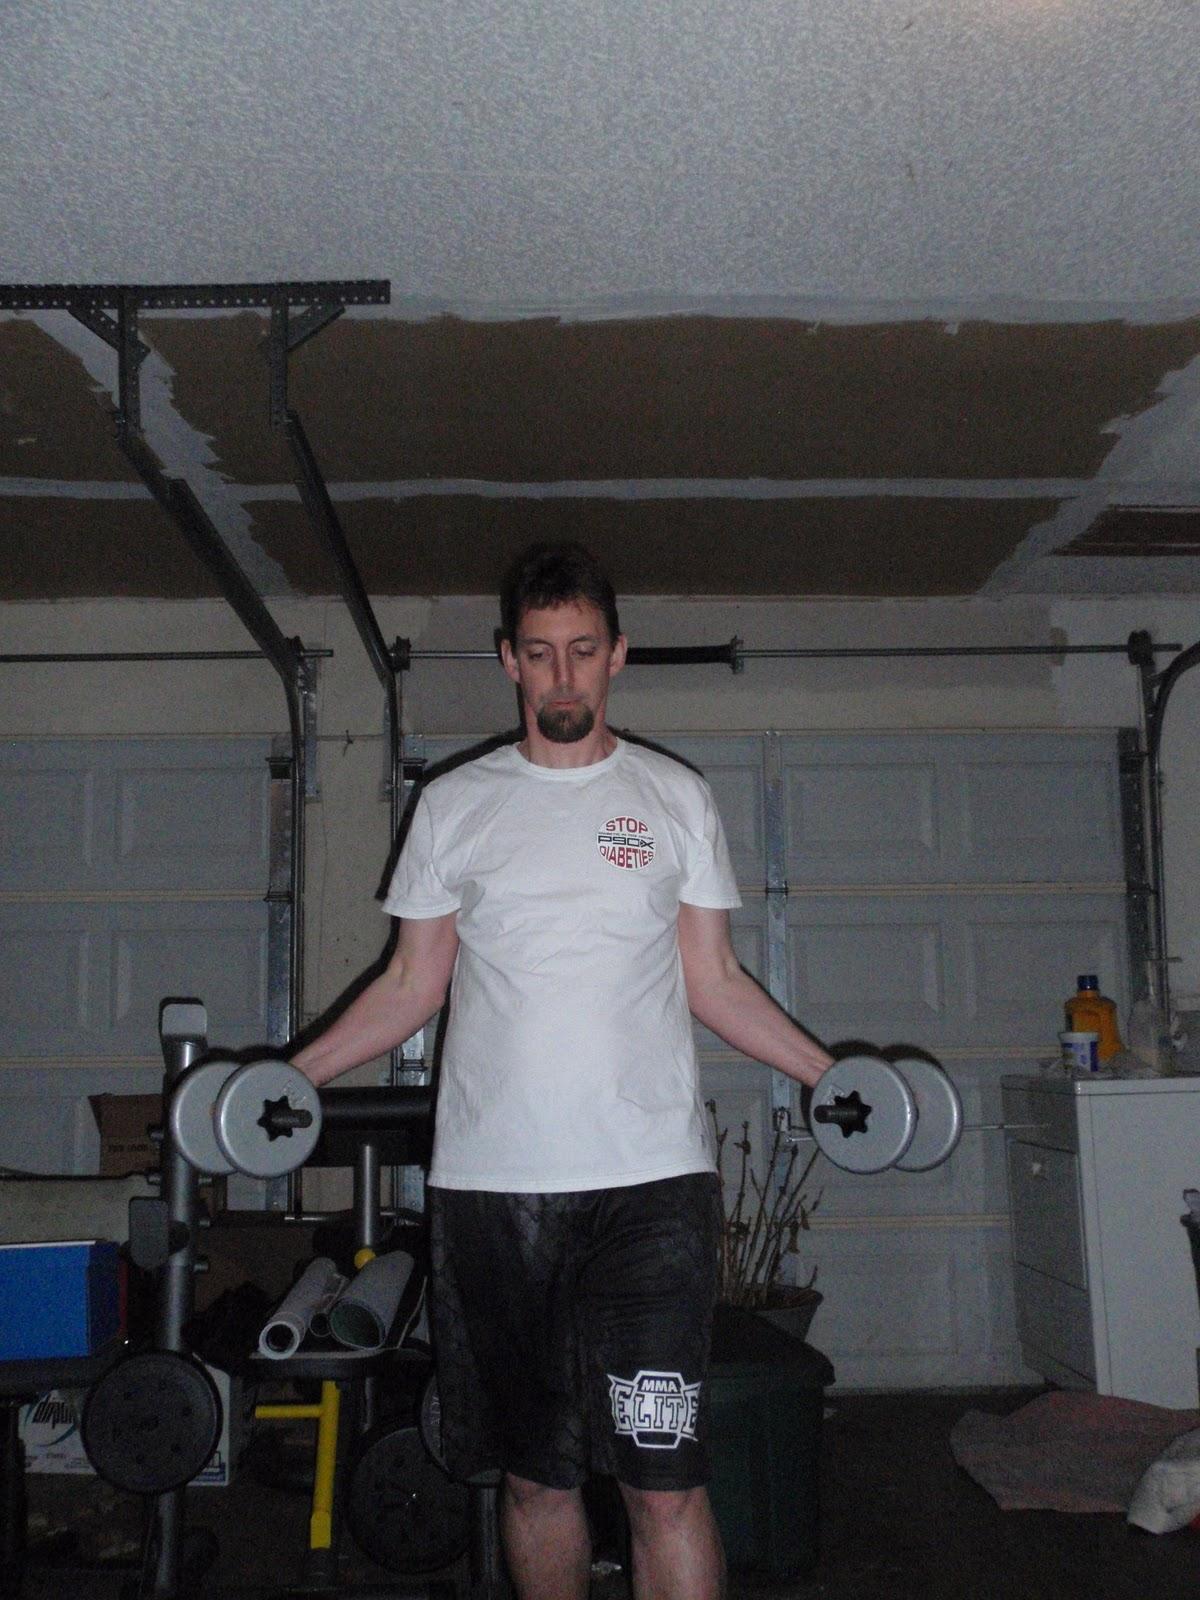 Dfw Home Fitness P90x Shoulder Amp Arms